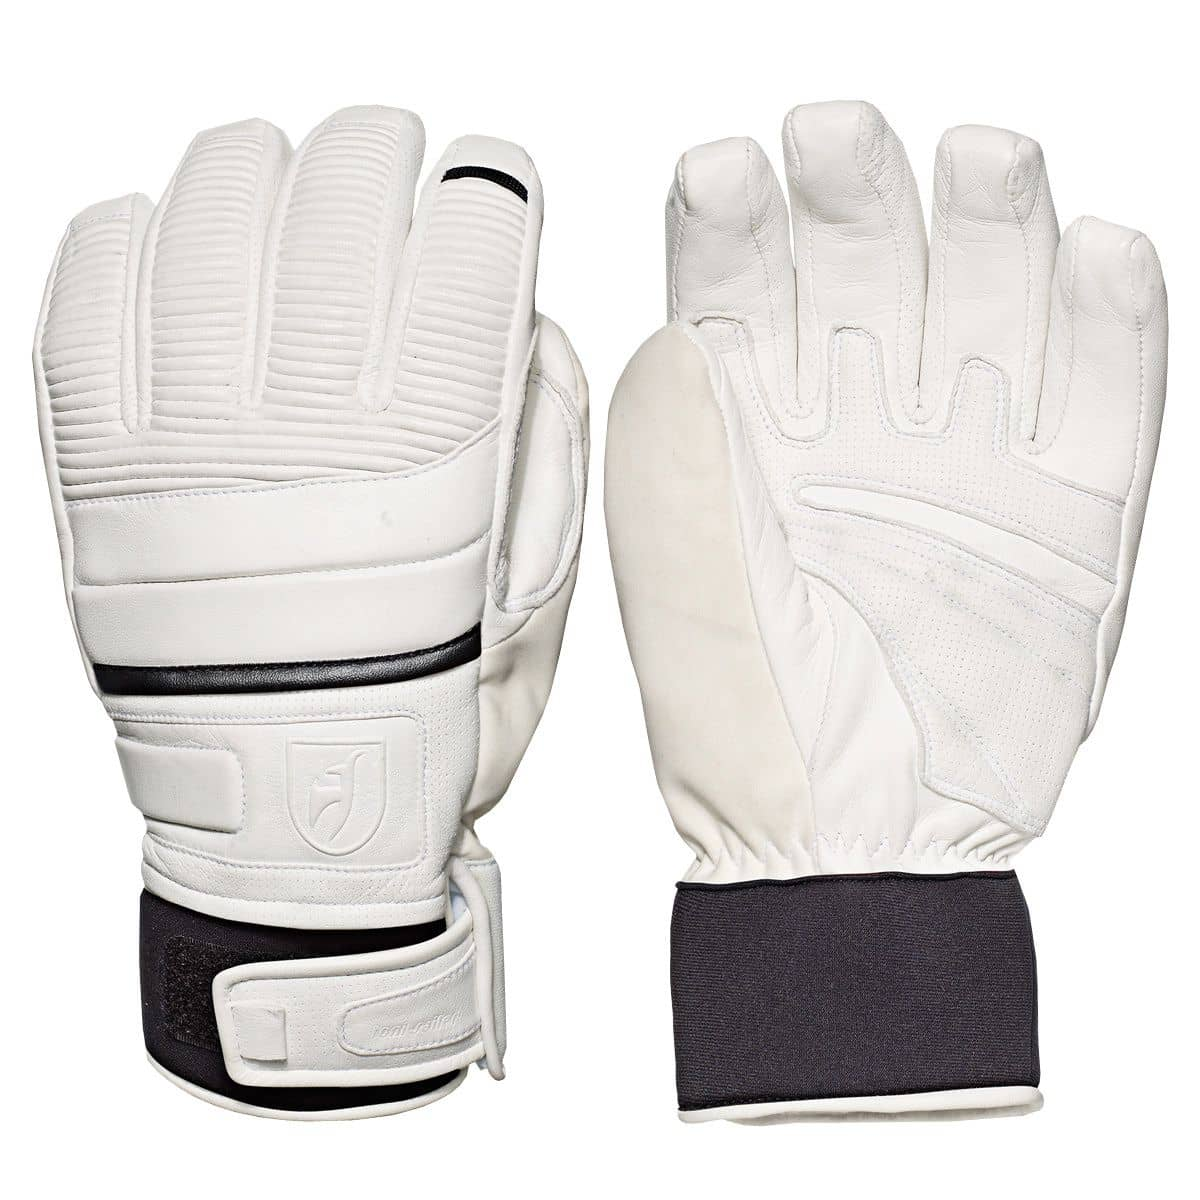 Toni Sailer Jesse Glove bright white